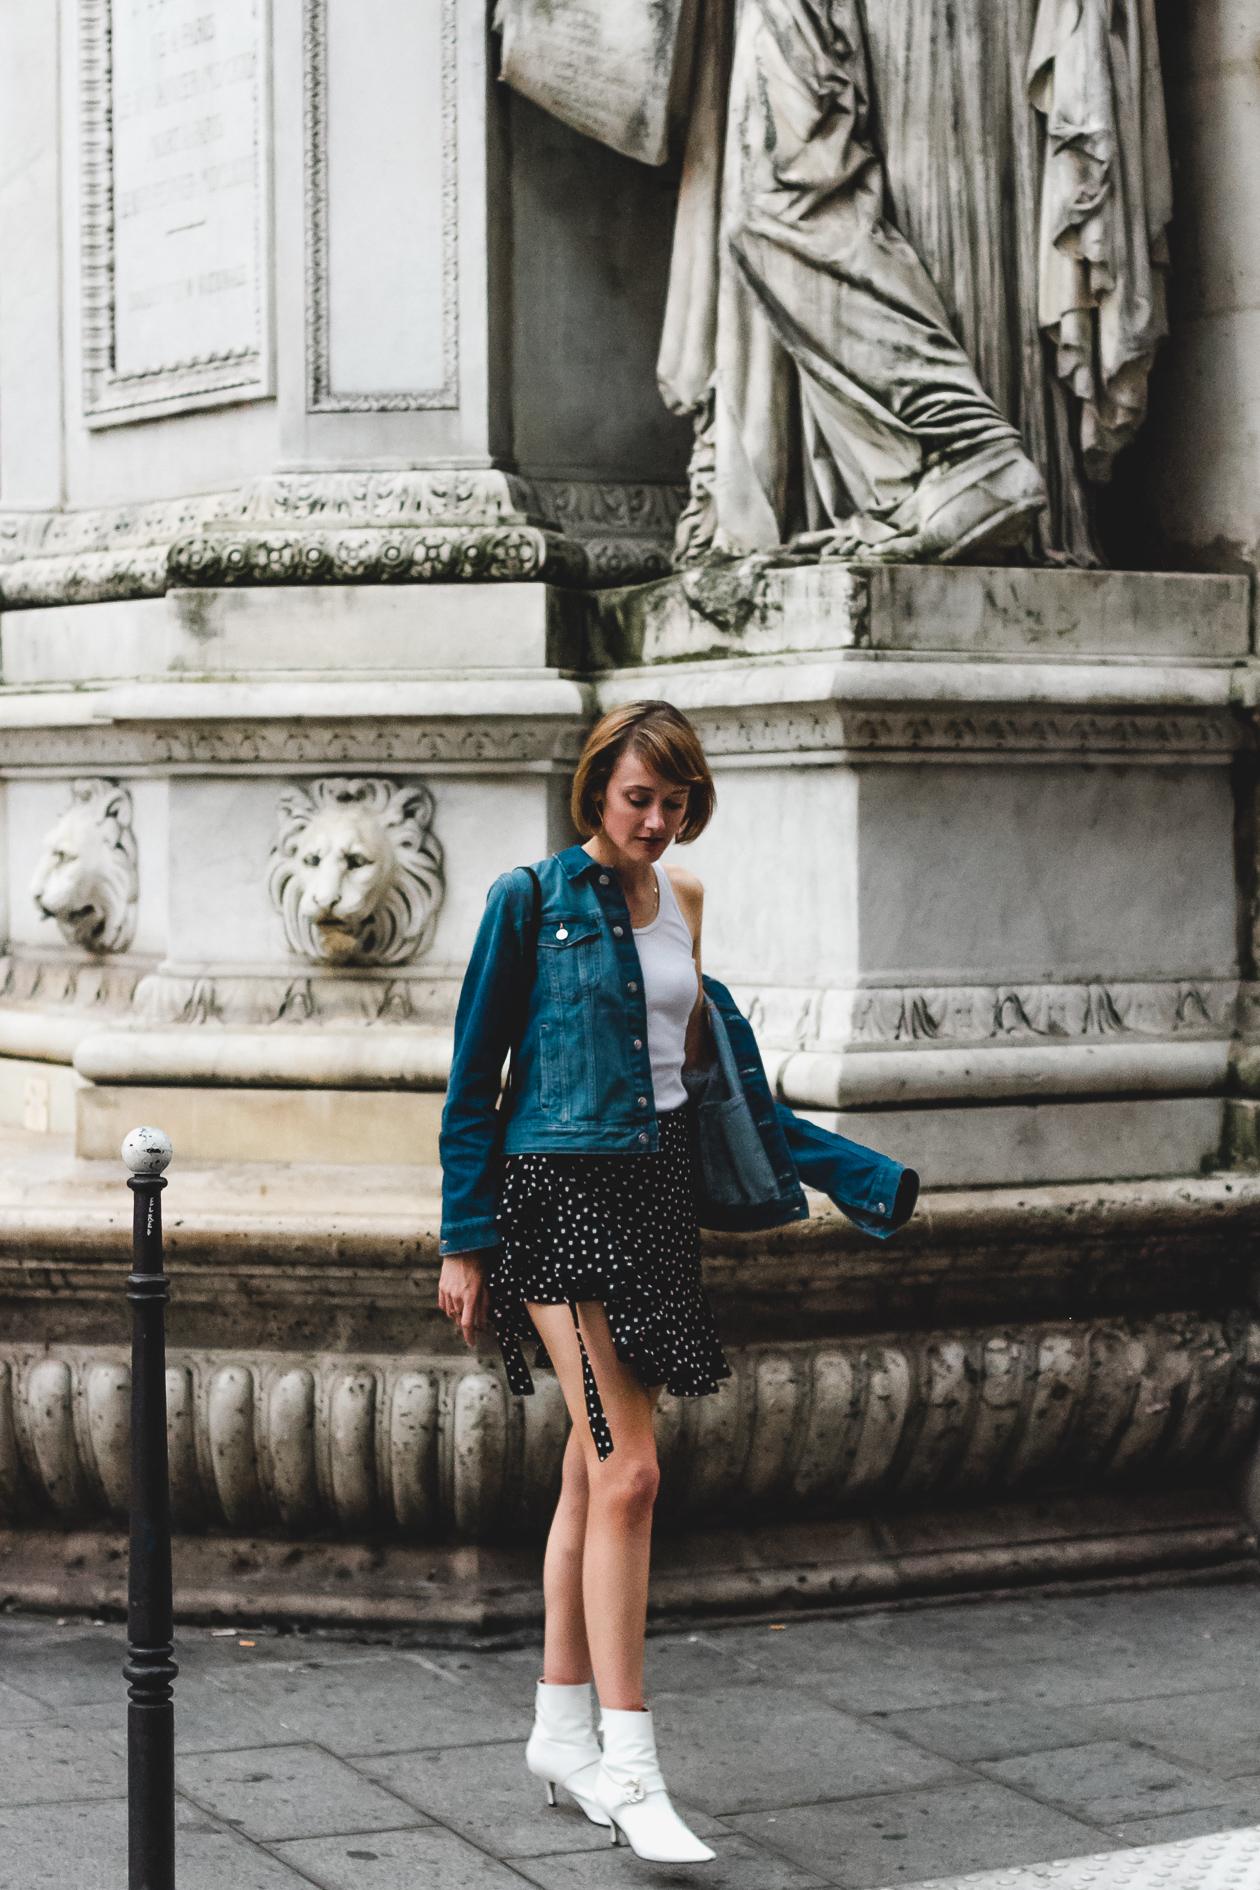 denim jacket and ruffled polka dot skirt